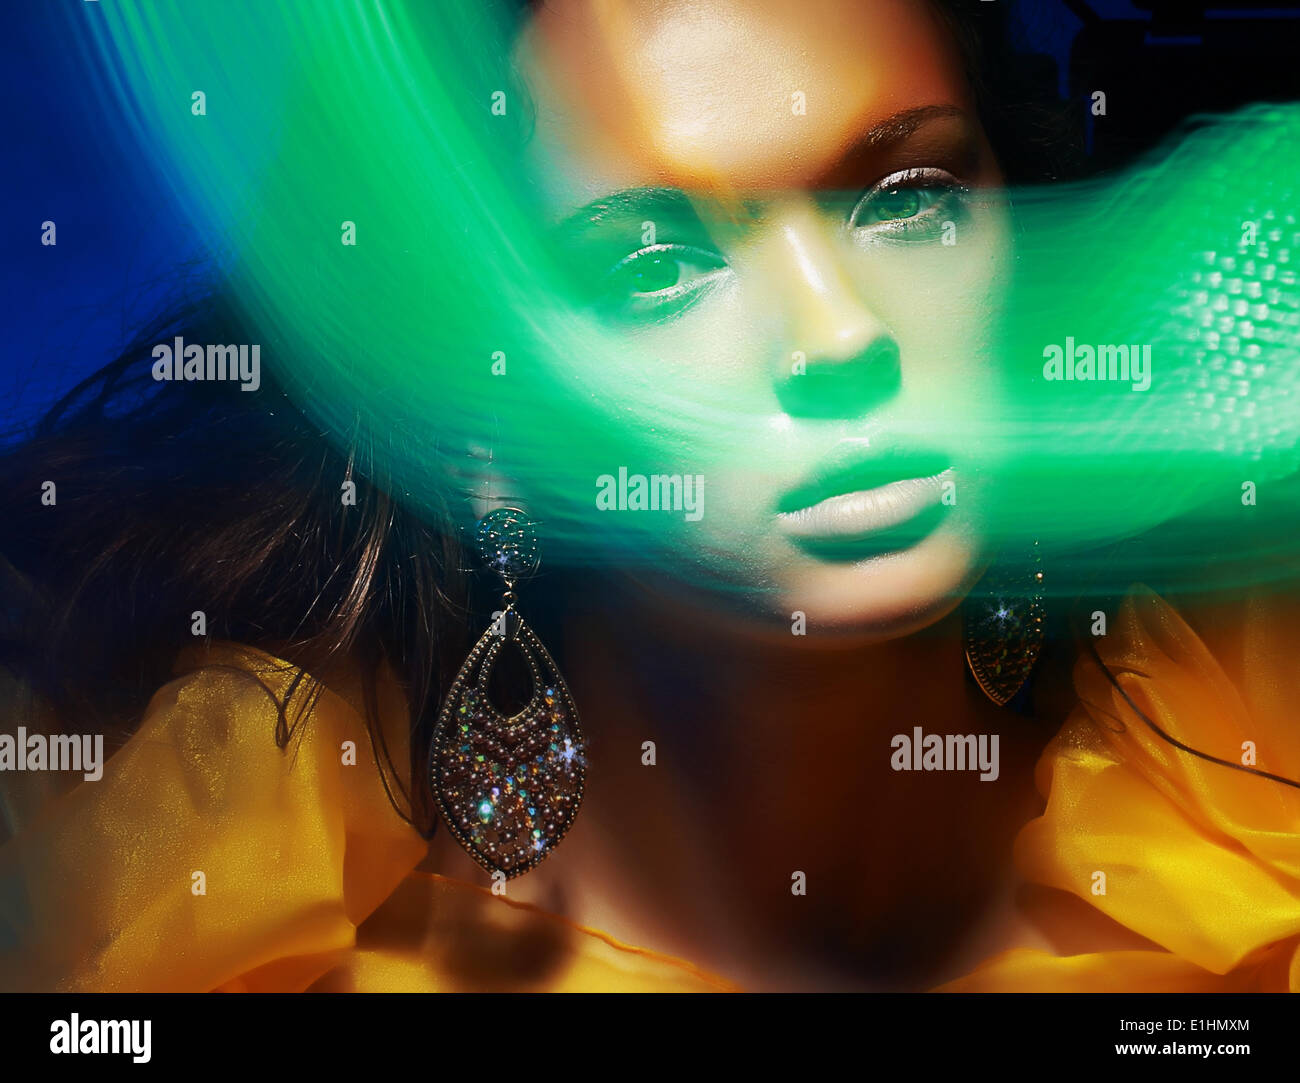 Diffuse. Fantasy. Silhouette of Woman's Face in Magic Disco Fog - Stock Image